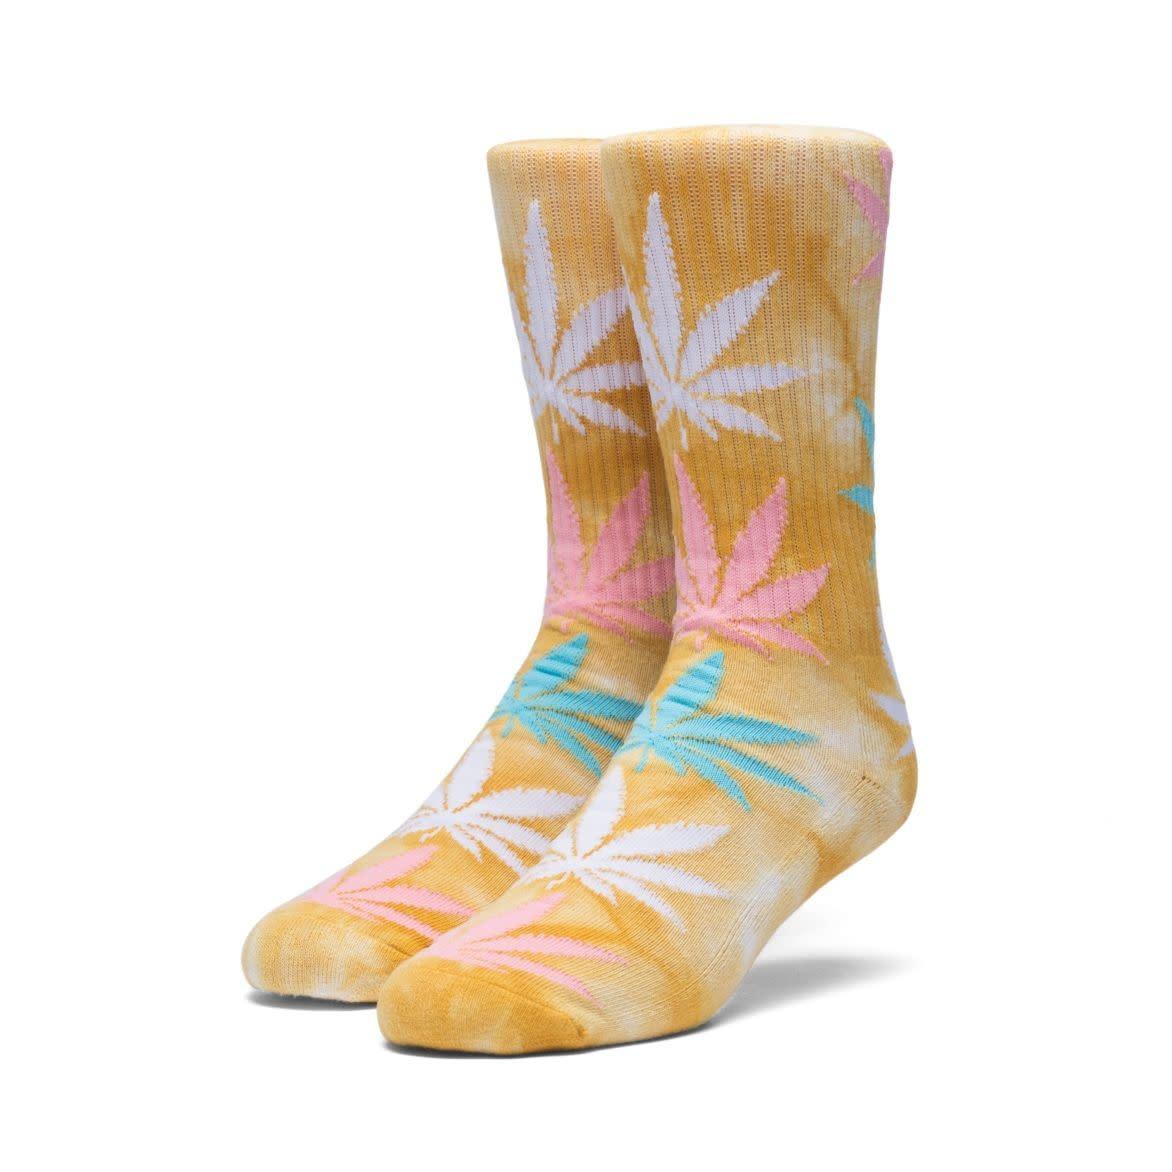 b7e73ade97177 HUF - Plantlife Strain Maui Waui Socks (Yellow)